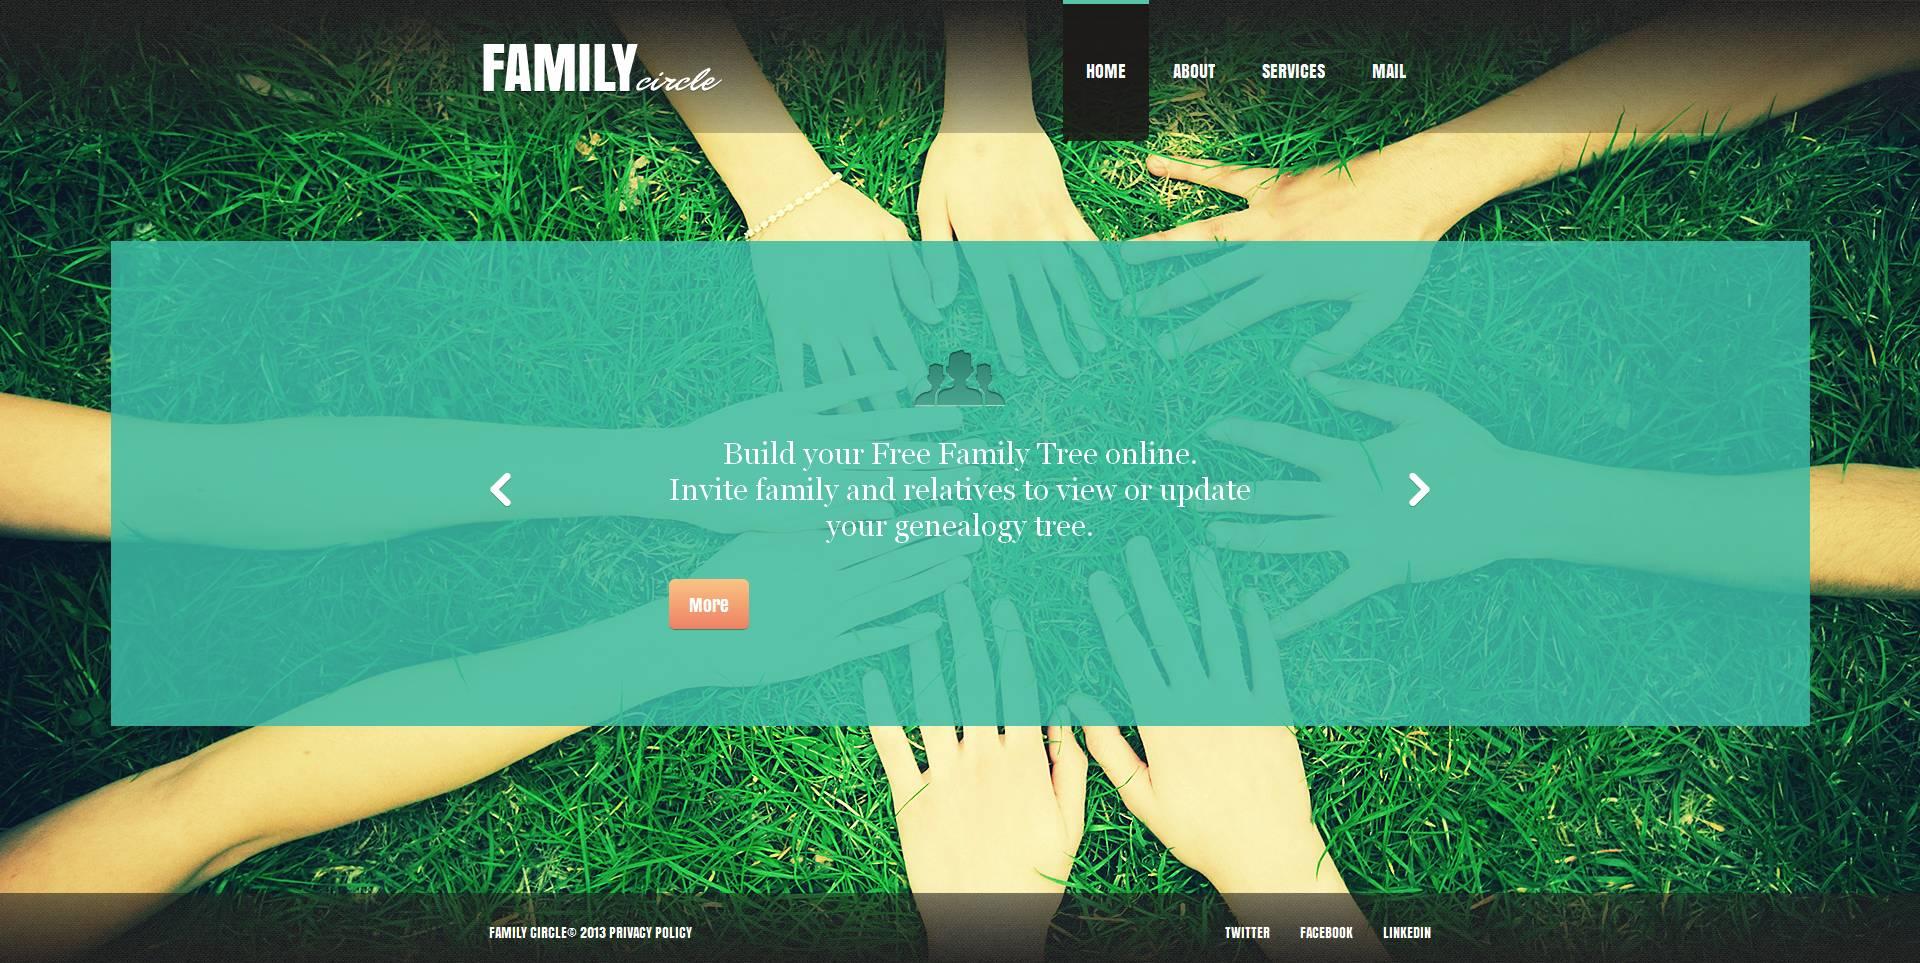 Szablon Moto CMS HTML #45620 na temat: centrum rodziny